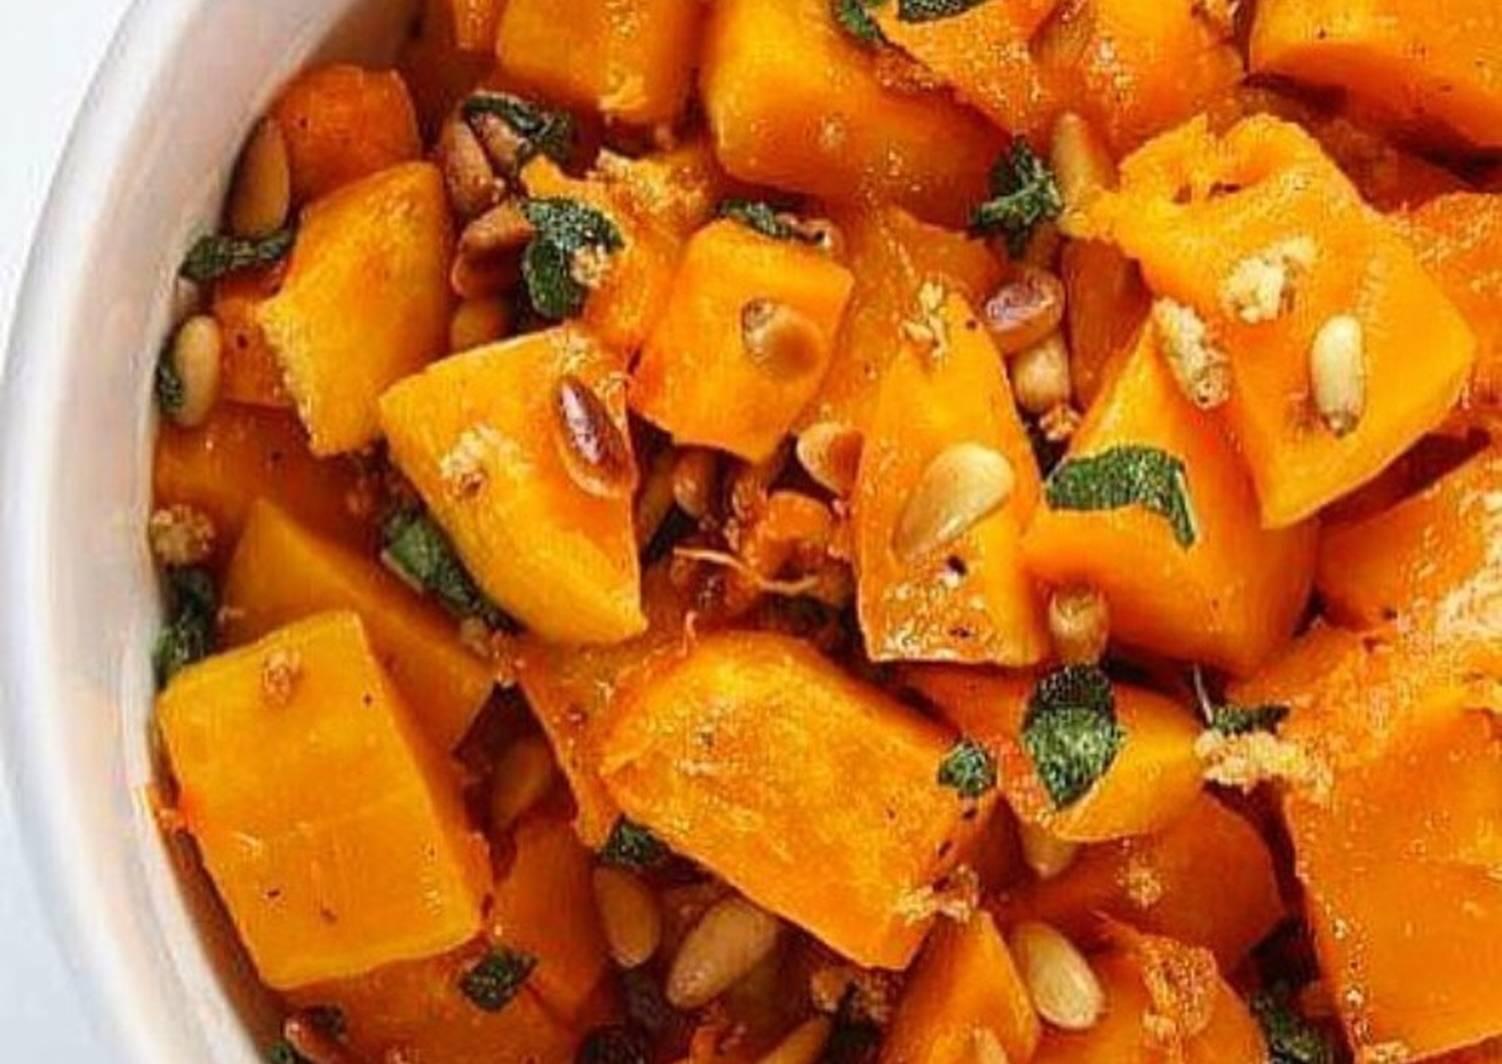 целях тыква в карамели рецепт с фото приготовления красивой закуски